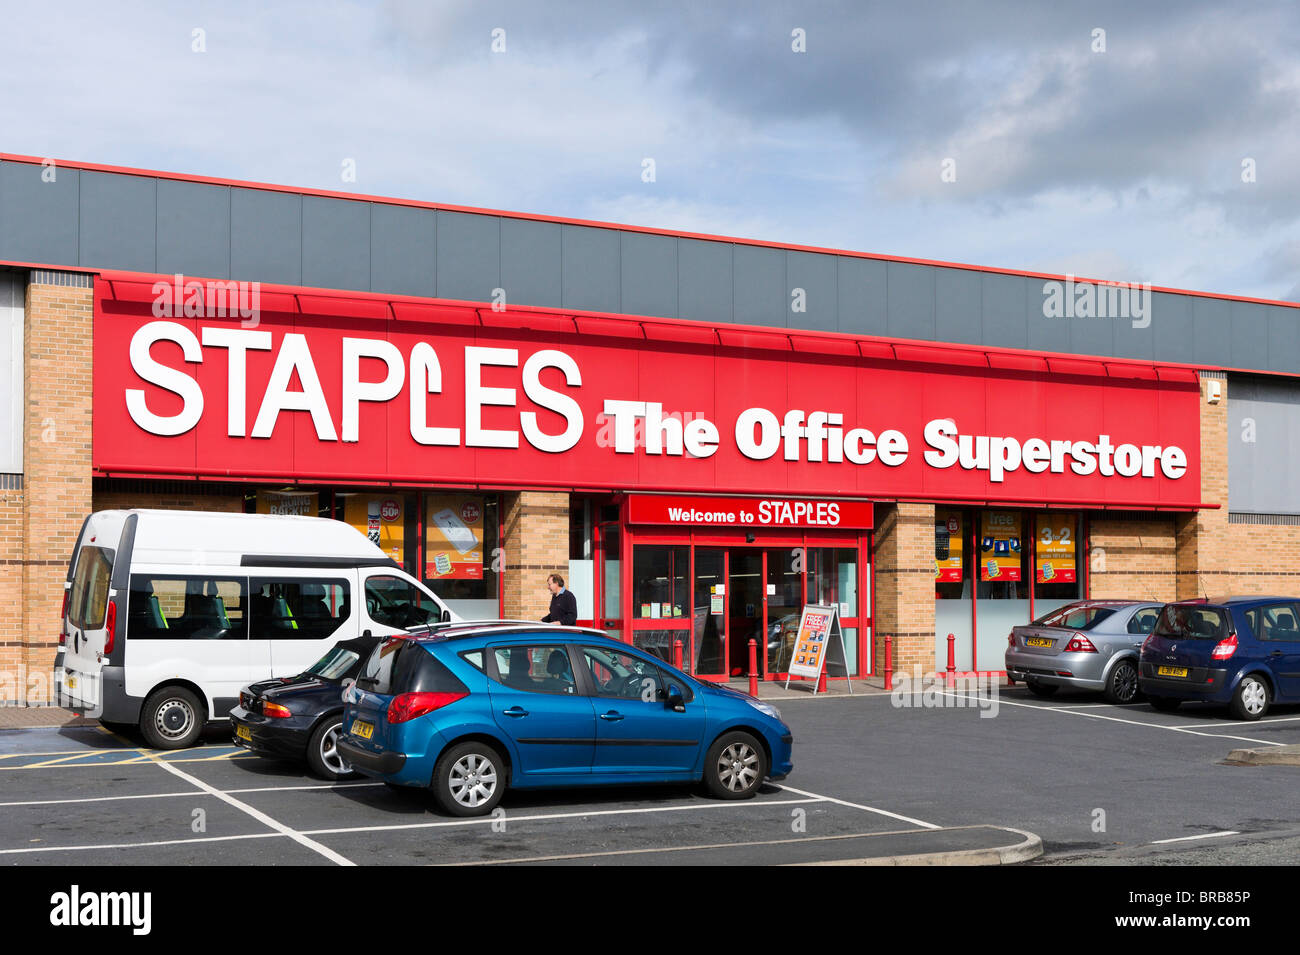 Staples office superstore, Leeds Road Retail Park, Leeds Road, Huddersfield, West Yorkshire, England, UK - Stock Image